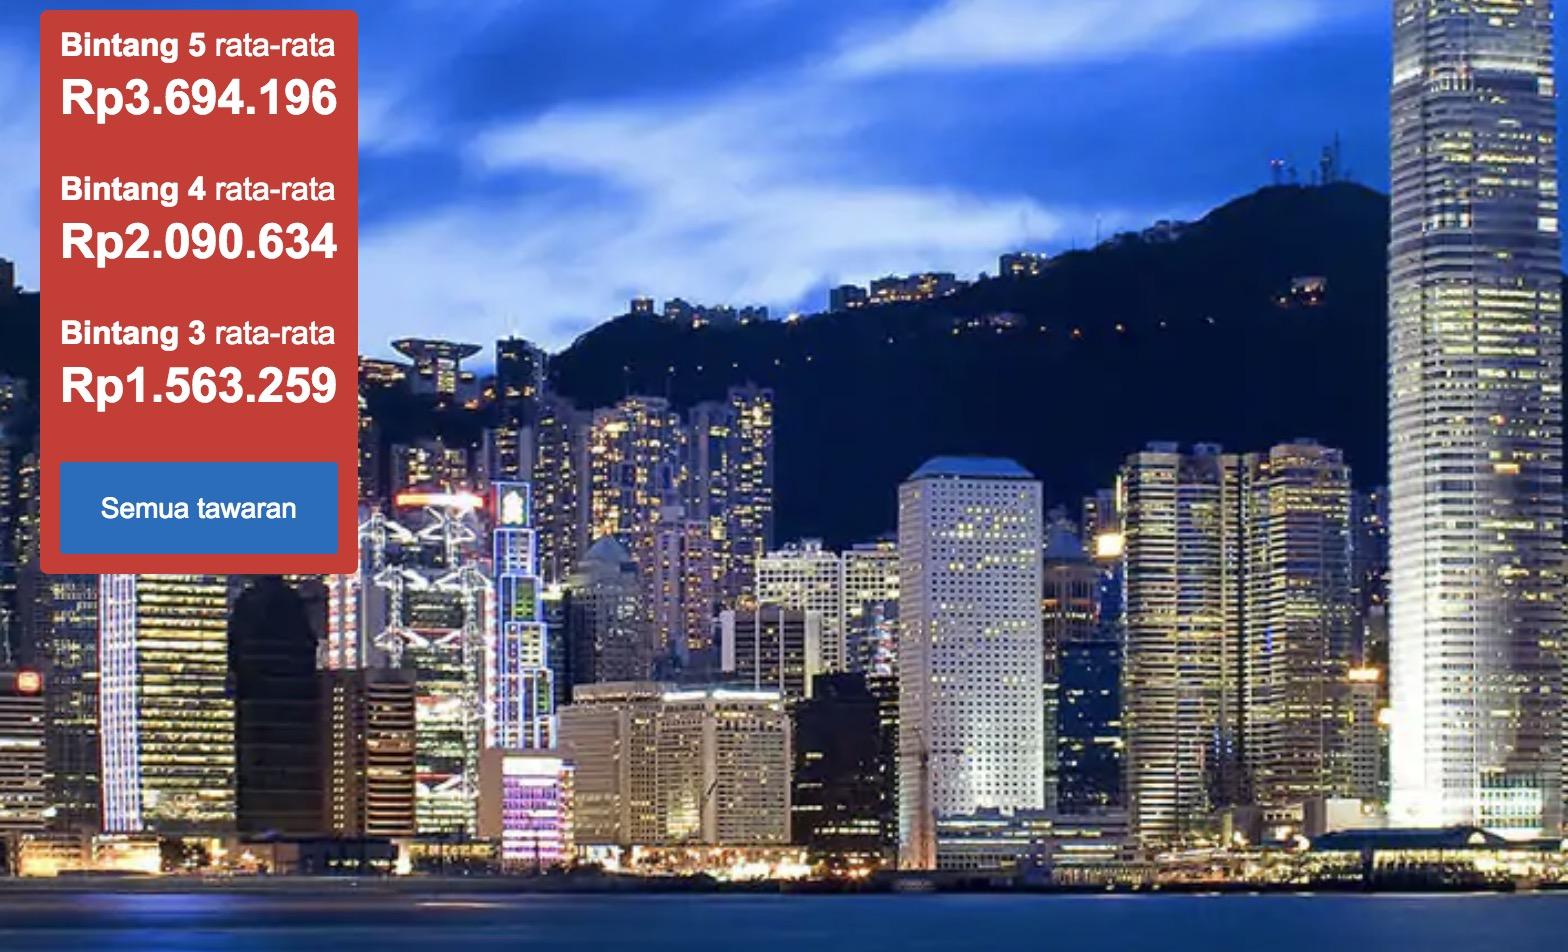 Hotel Murah Di Hong Kong Mulai Dari 1.5jt